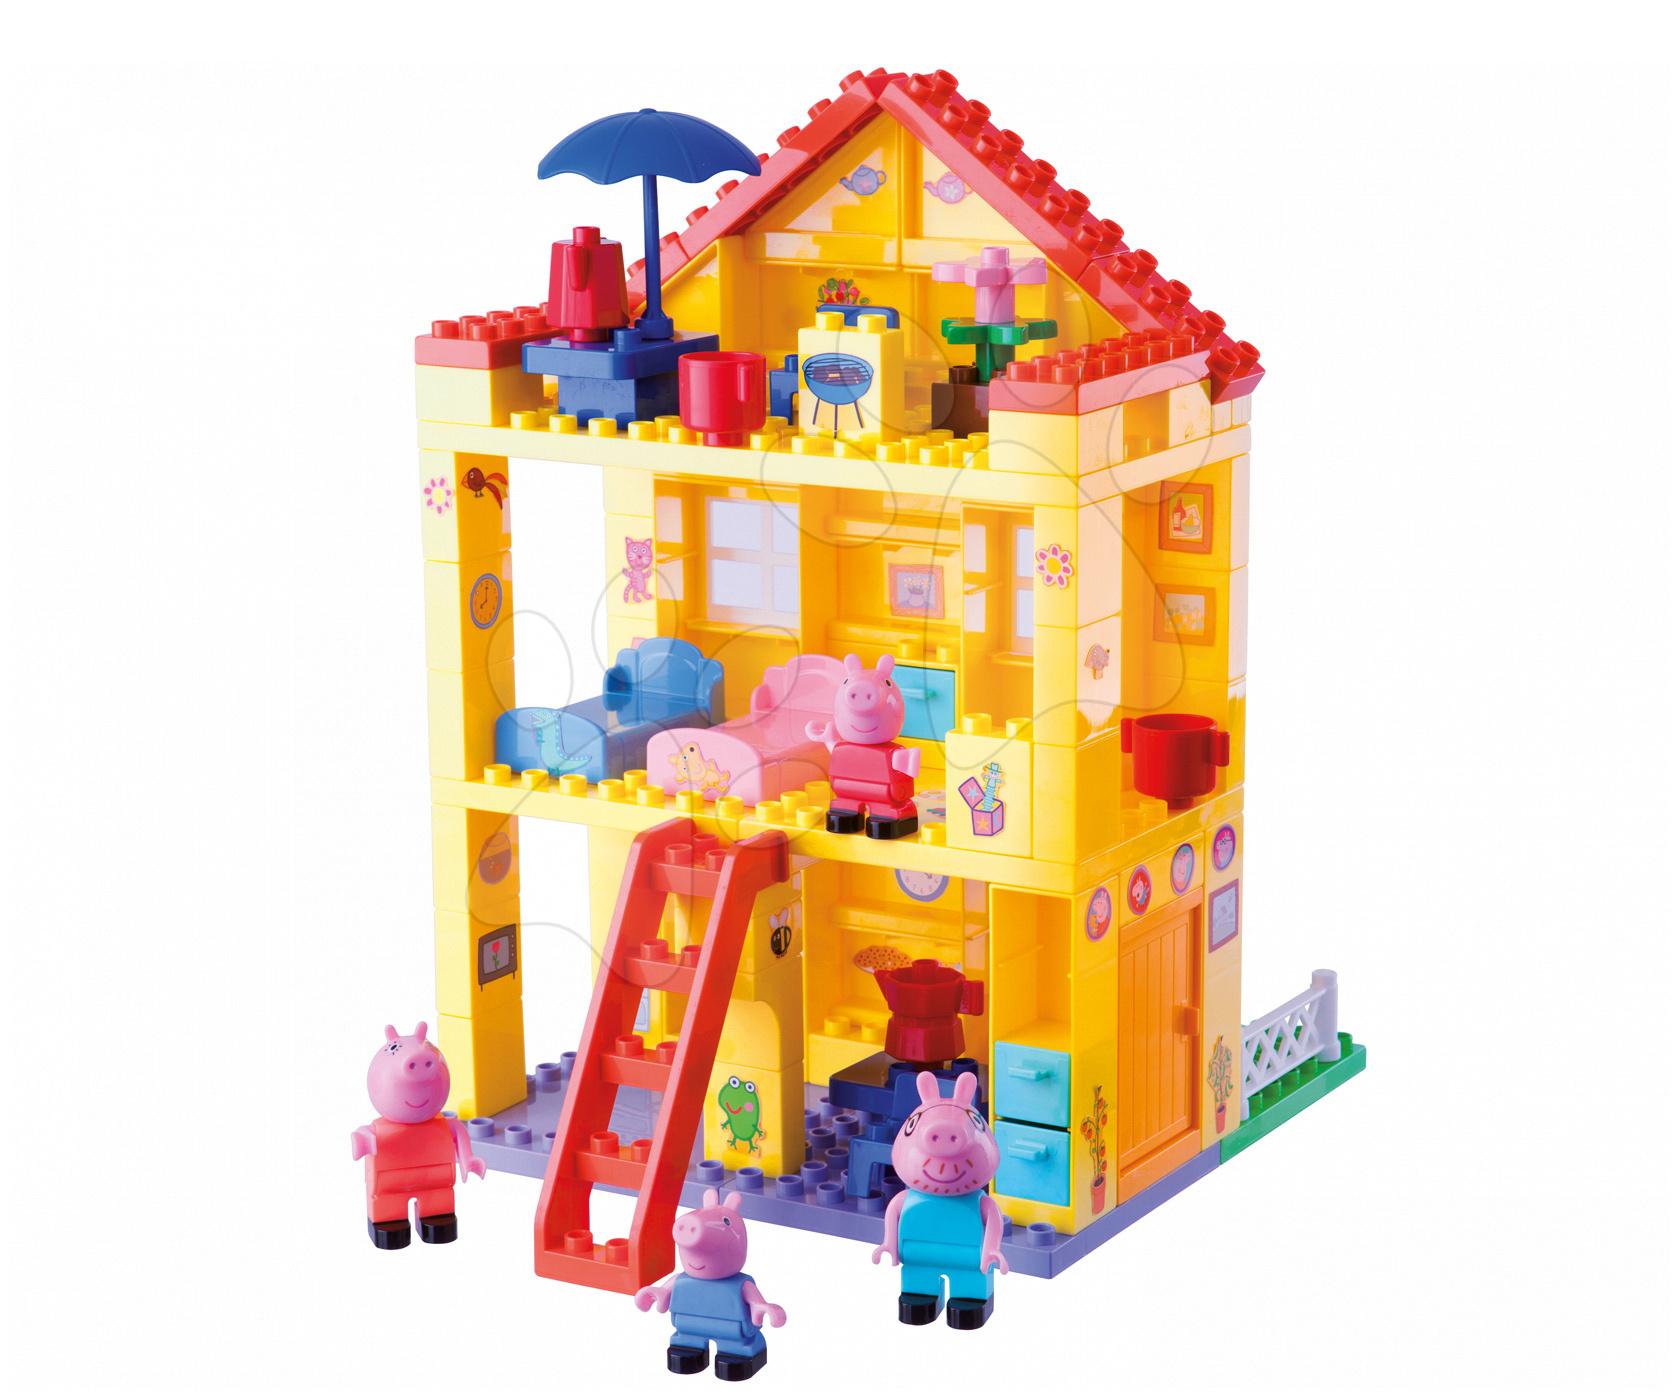 Stavebnice BIG-Bloxx jako lego - Stavebnice Peppa Pig rodinka v domku Bloxx BIG PlayBIG se 4 figurkami 107 dílů